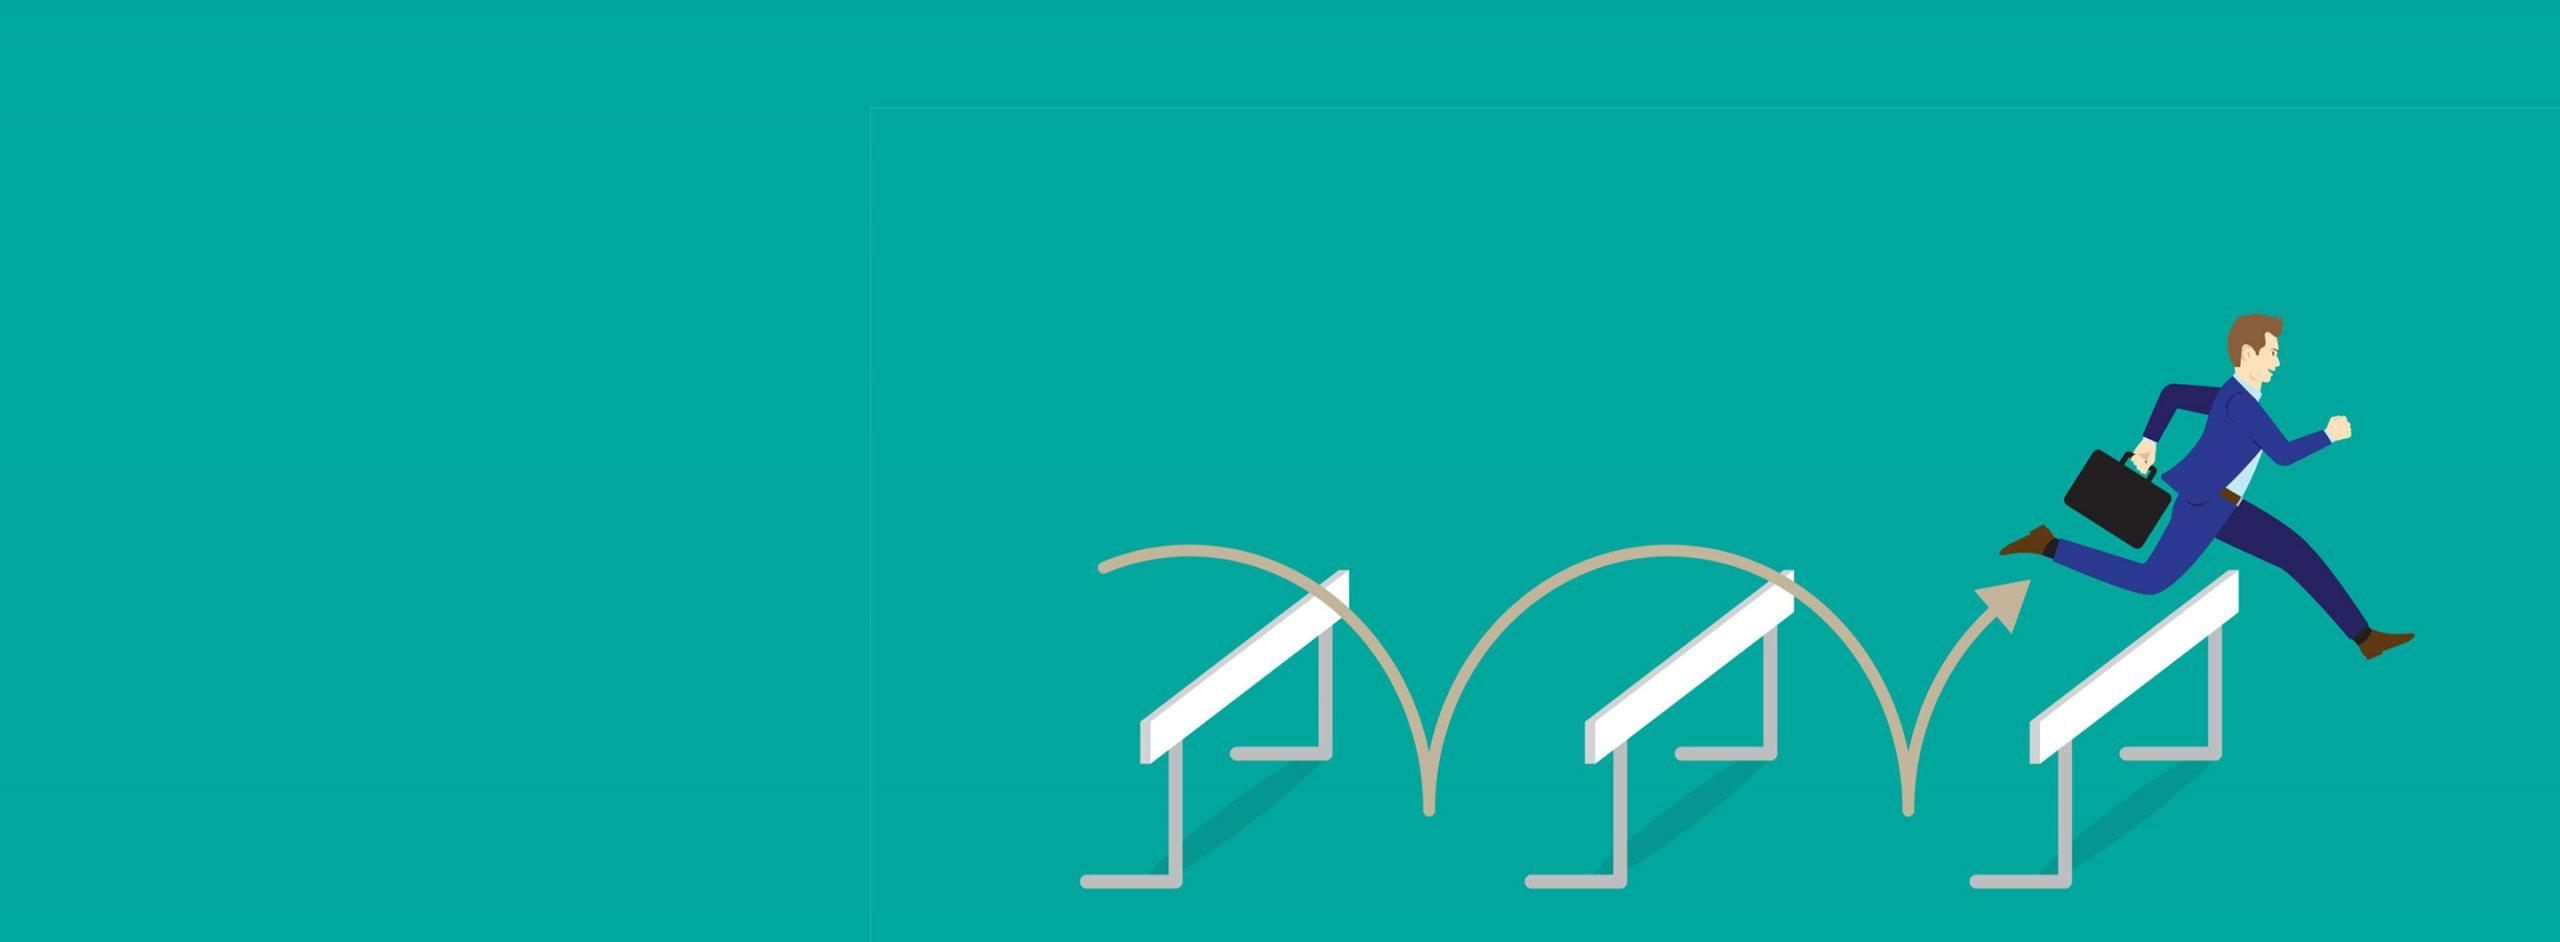 blog-banner-Four-Common-Roadblocks-to-PLM-Platform-Success